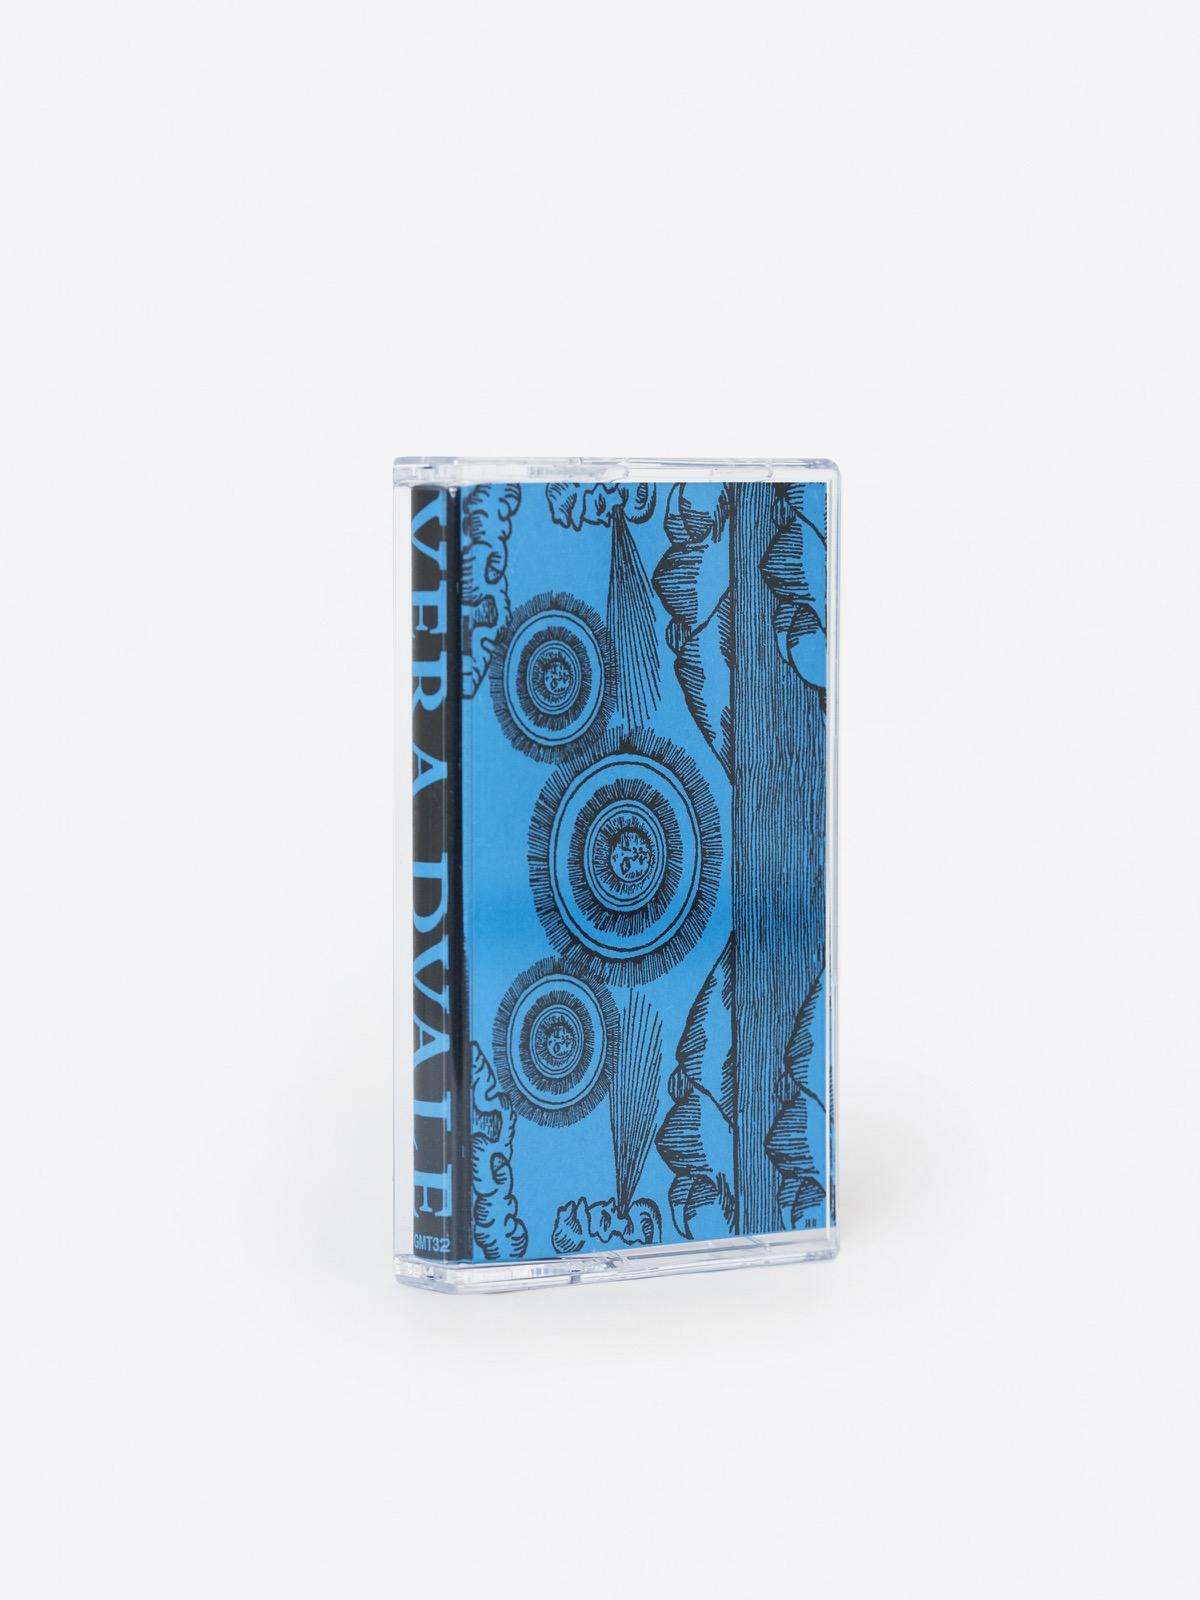 good morning tapes vera dvale